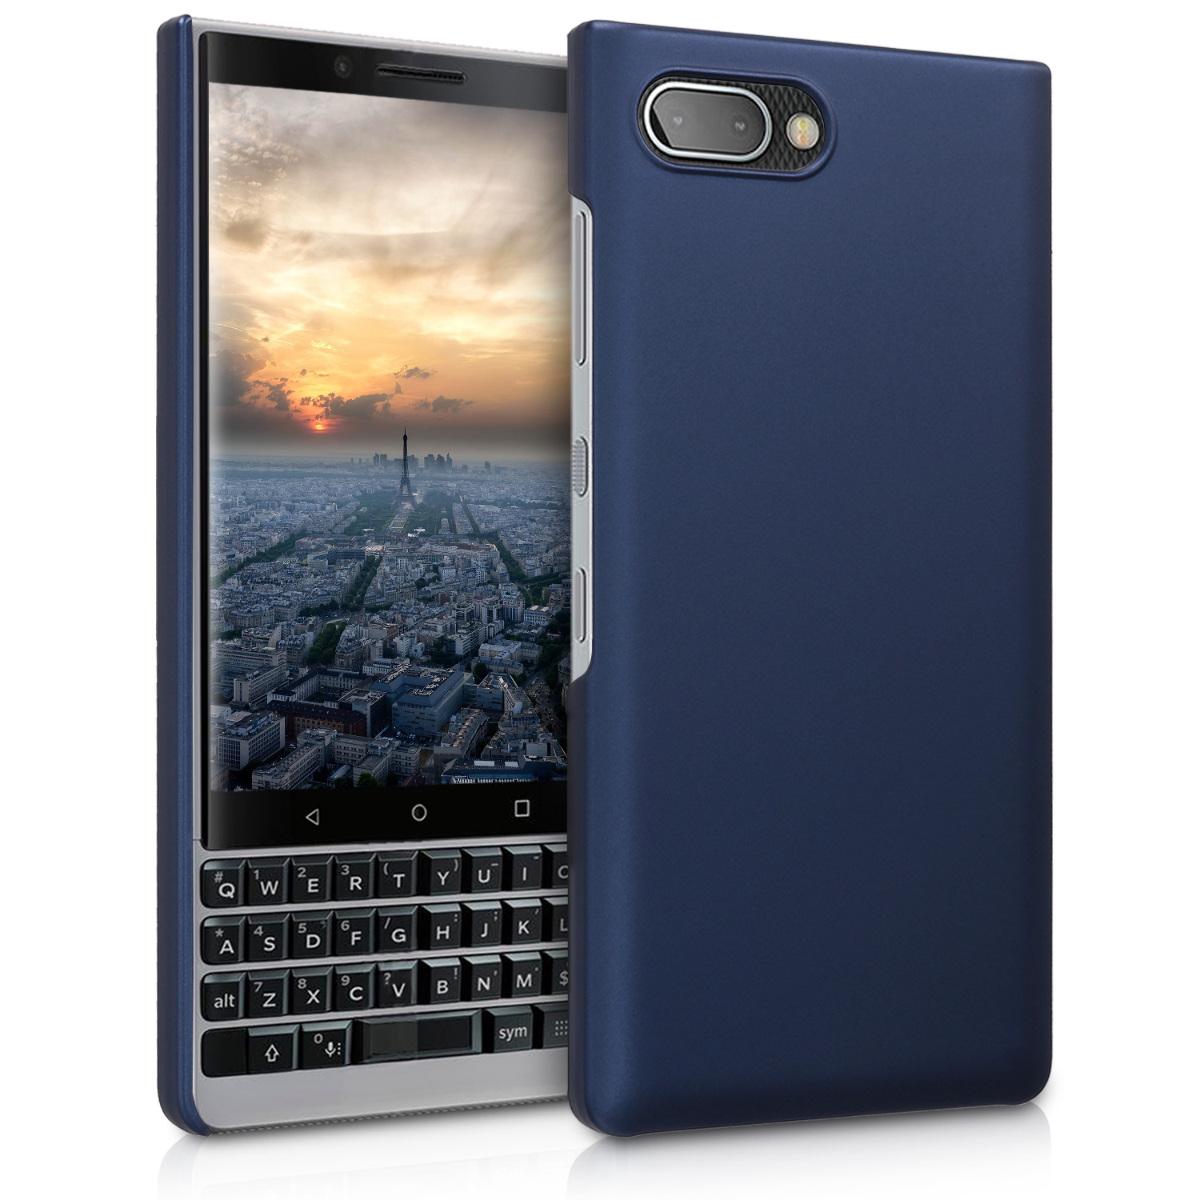 KW Slim Anti-Slip Cover - Σκληρή Θήκη Καουτσούκ BlackBerry KEY2 - Metallic Blue (46063.64)